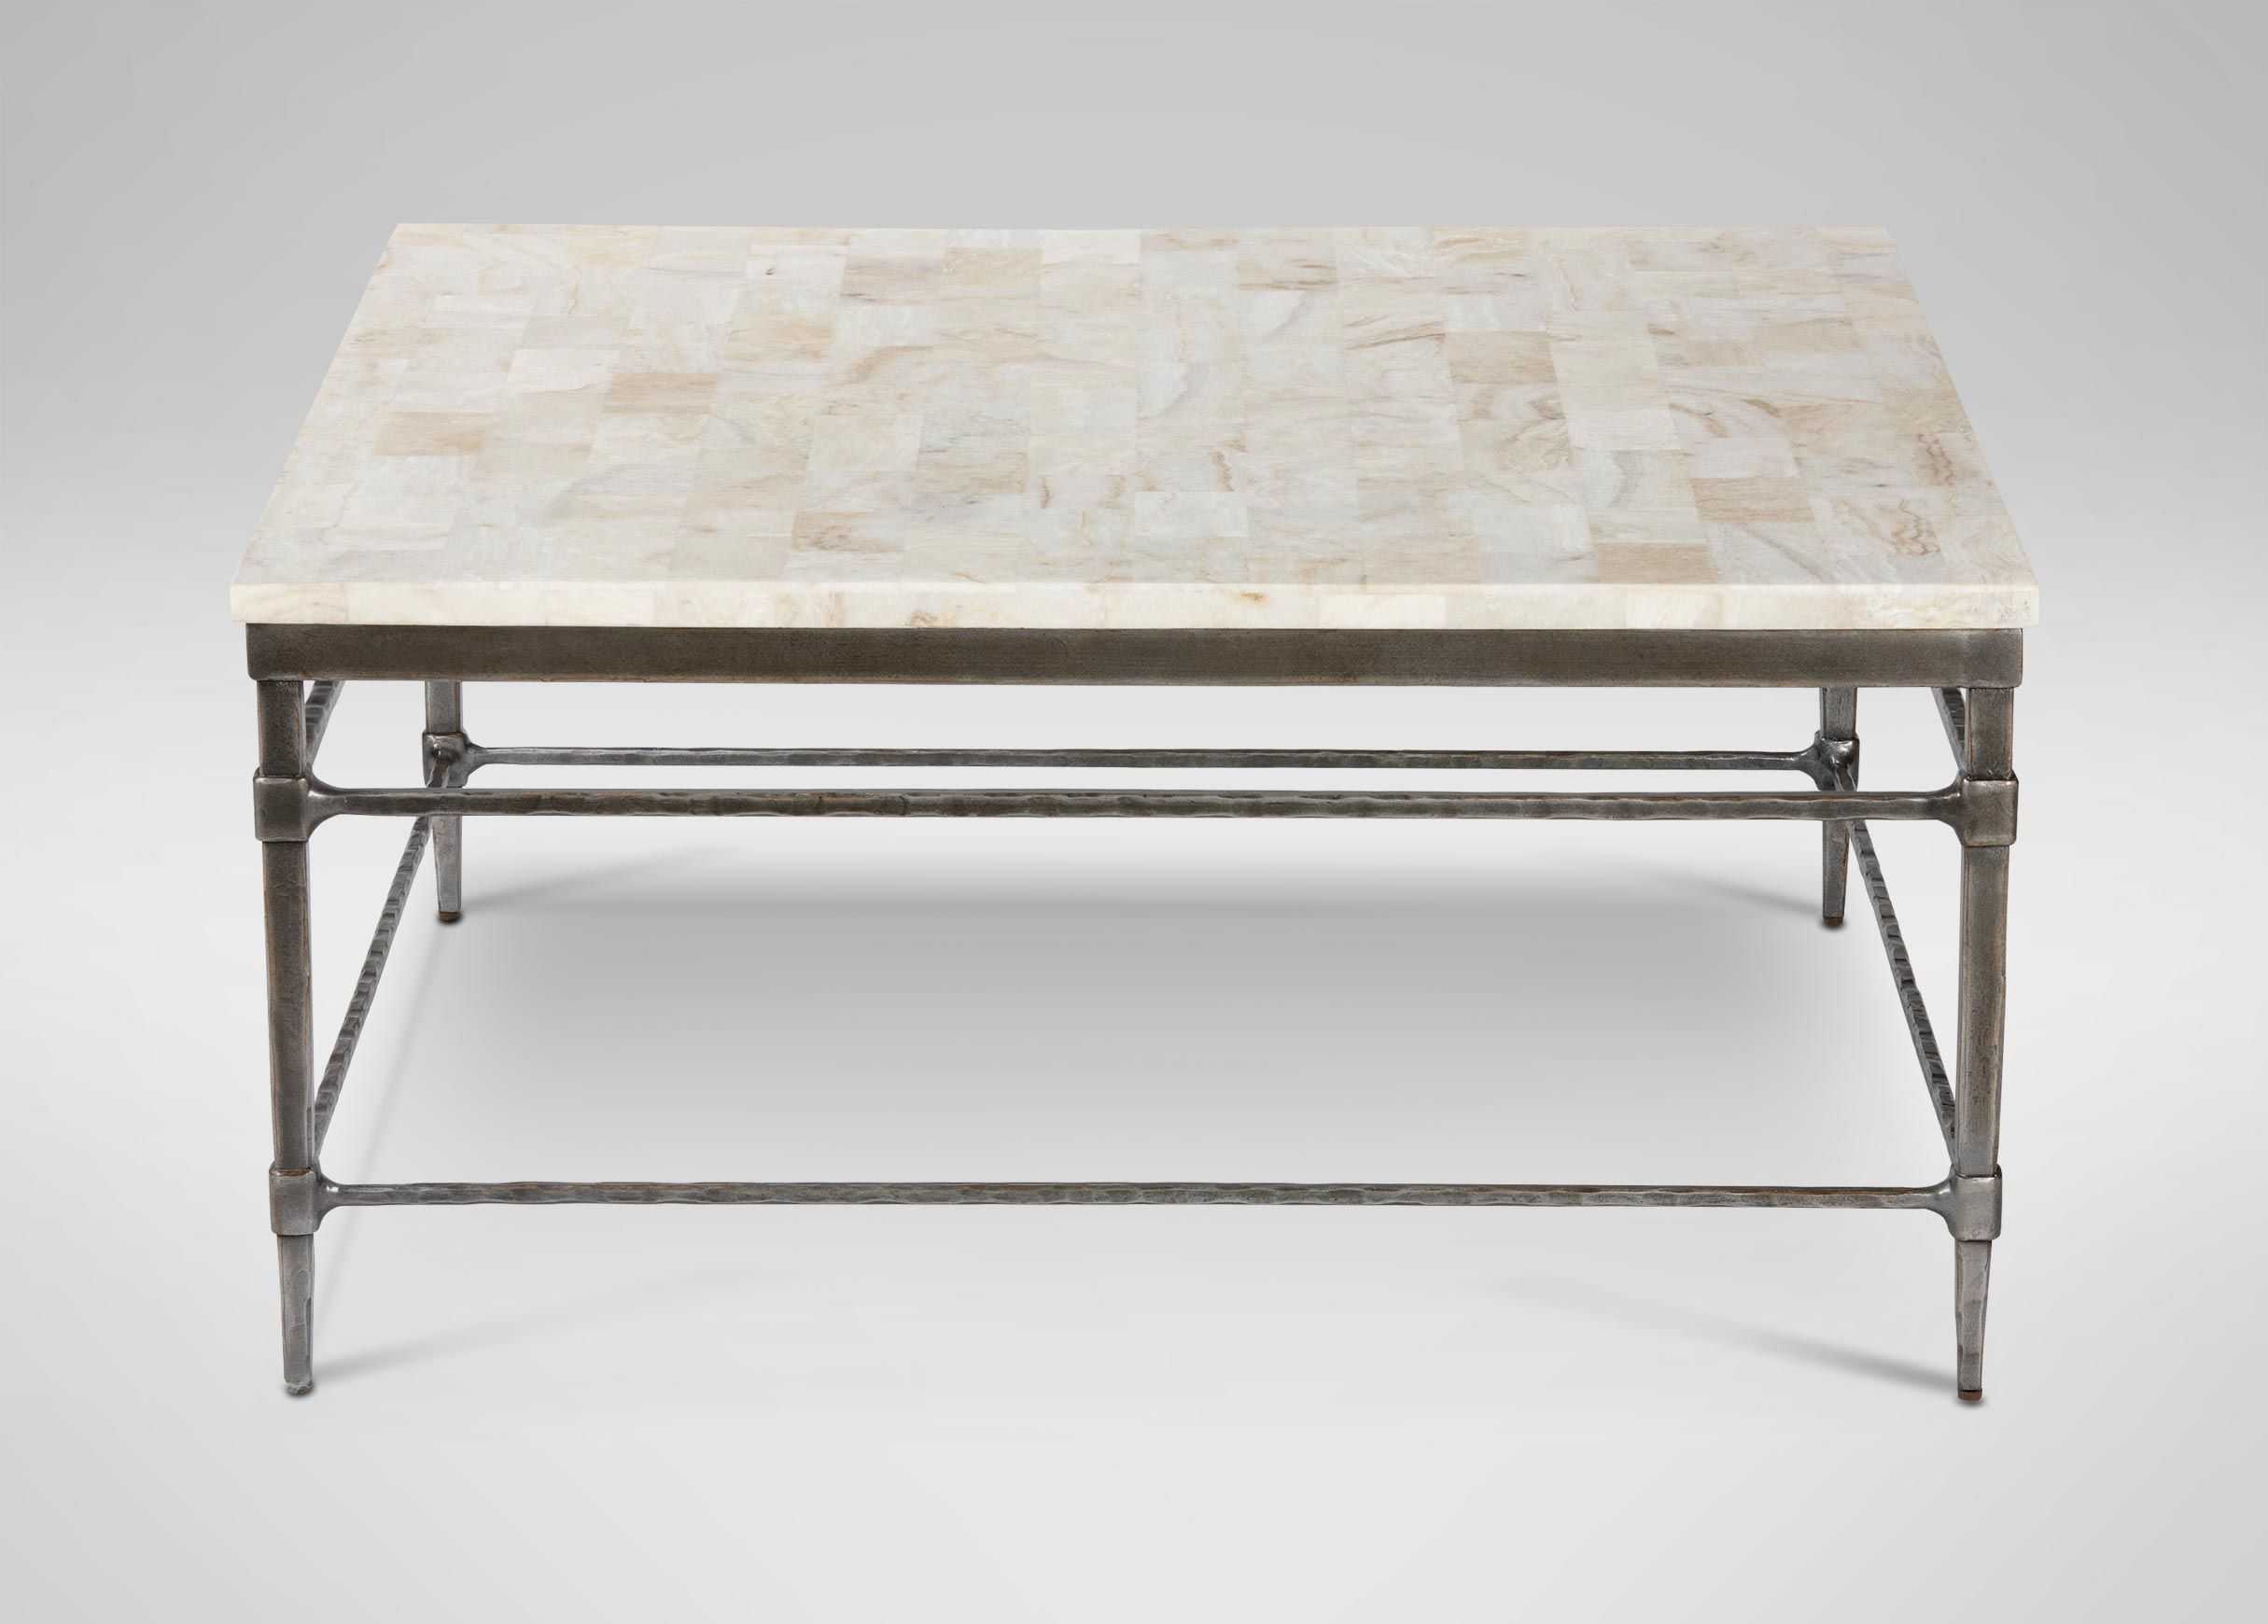 Vida Square Stone Top Coffee Table Coffee Tables Coffee Table Square Square Marble Coffee Table Coffee Table